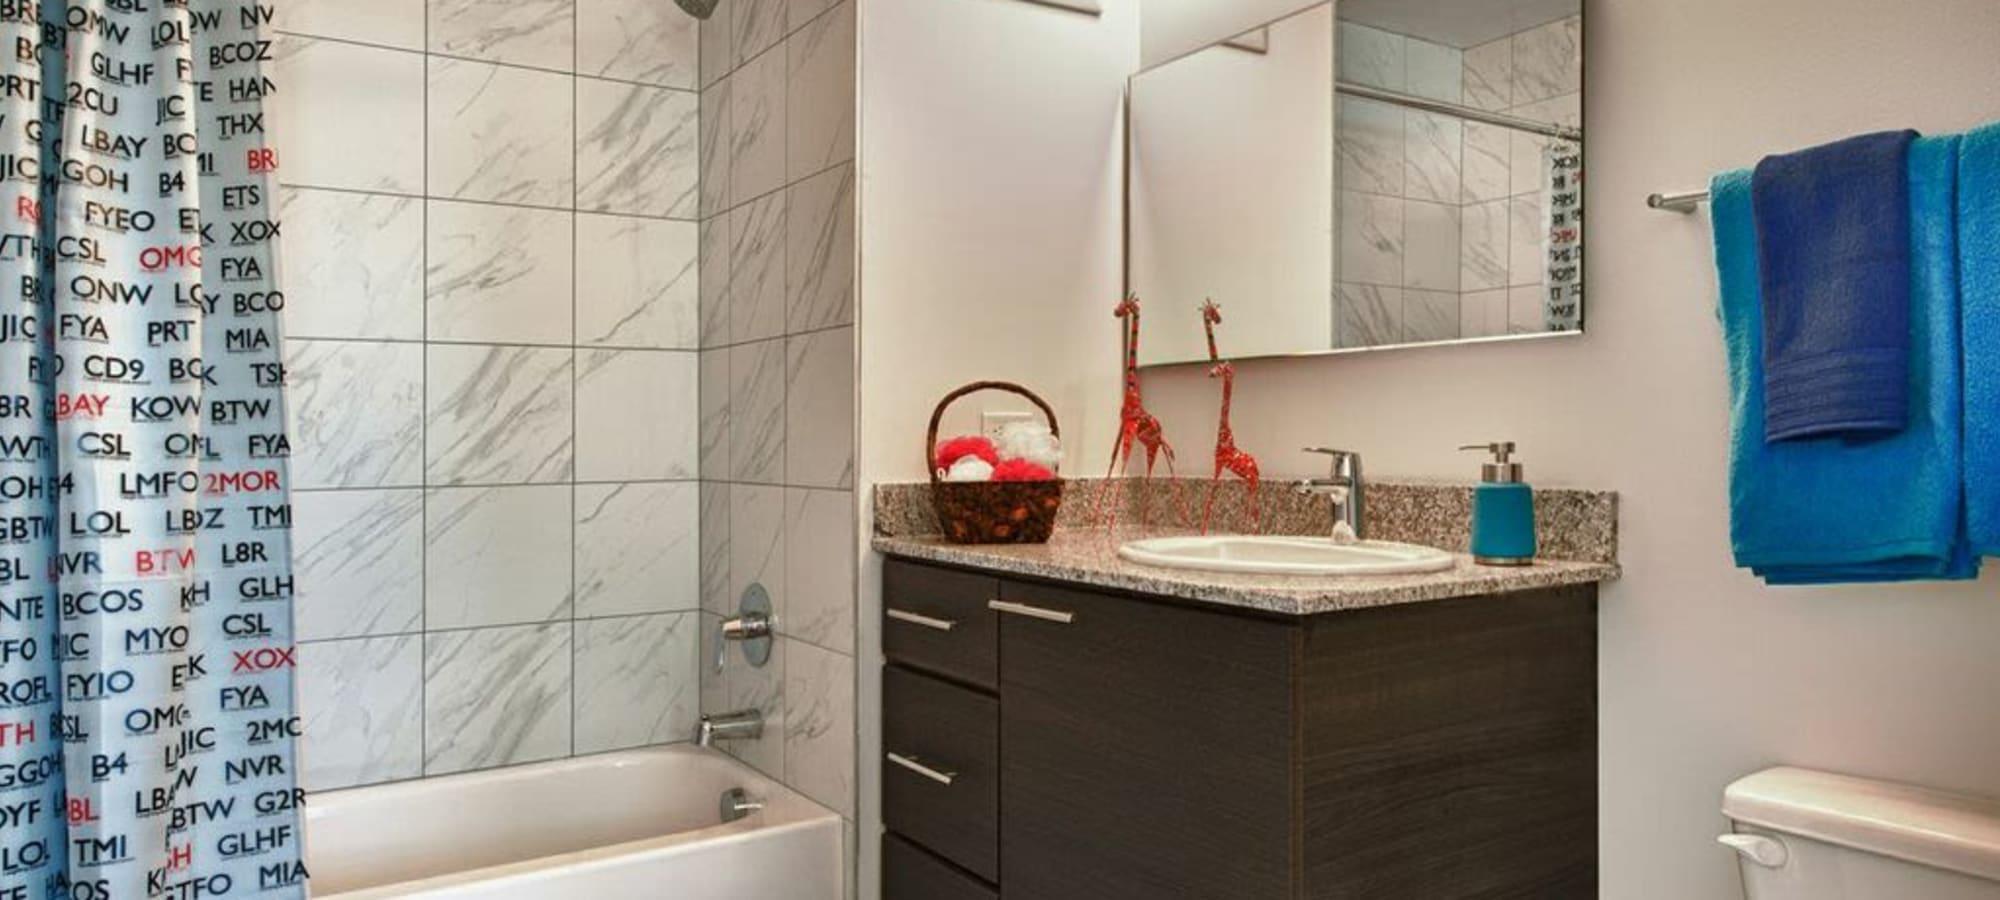 Luxury bathroom at apartments in Phoenix, Arizona